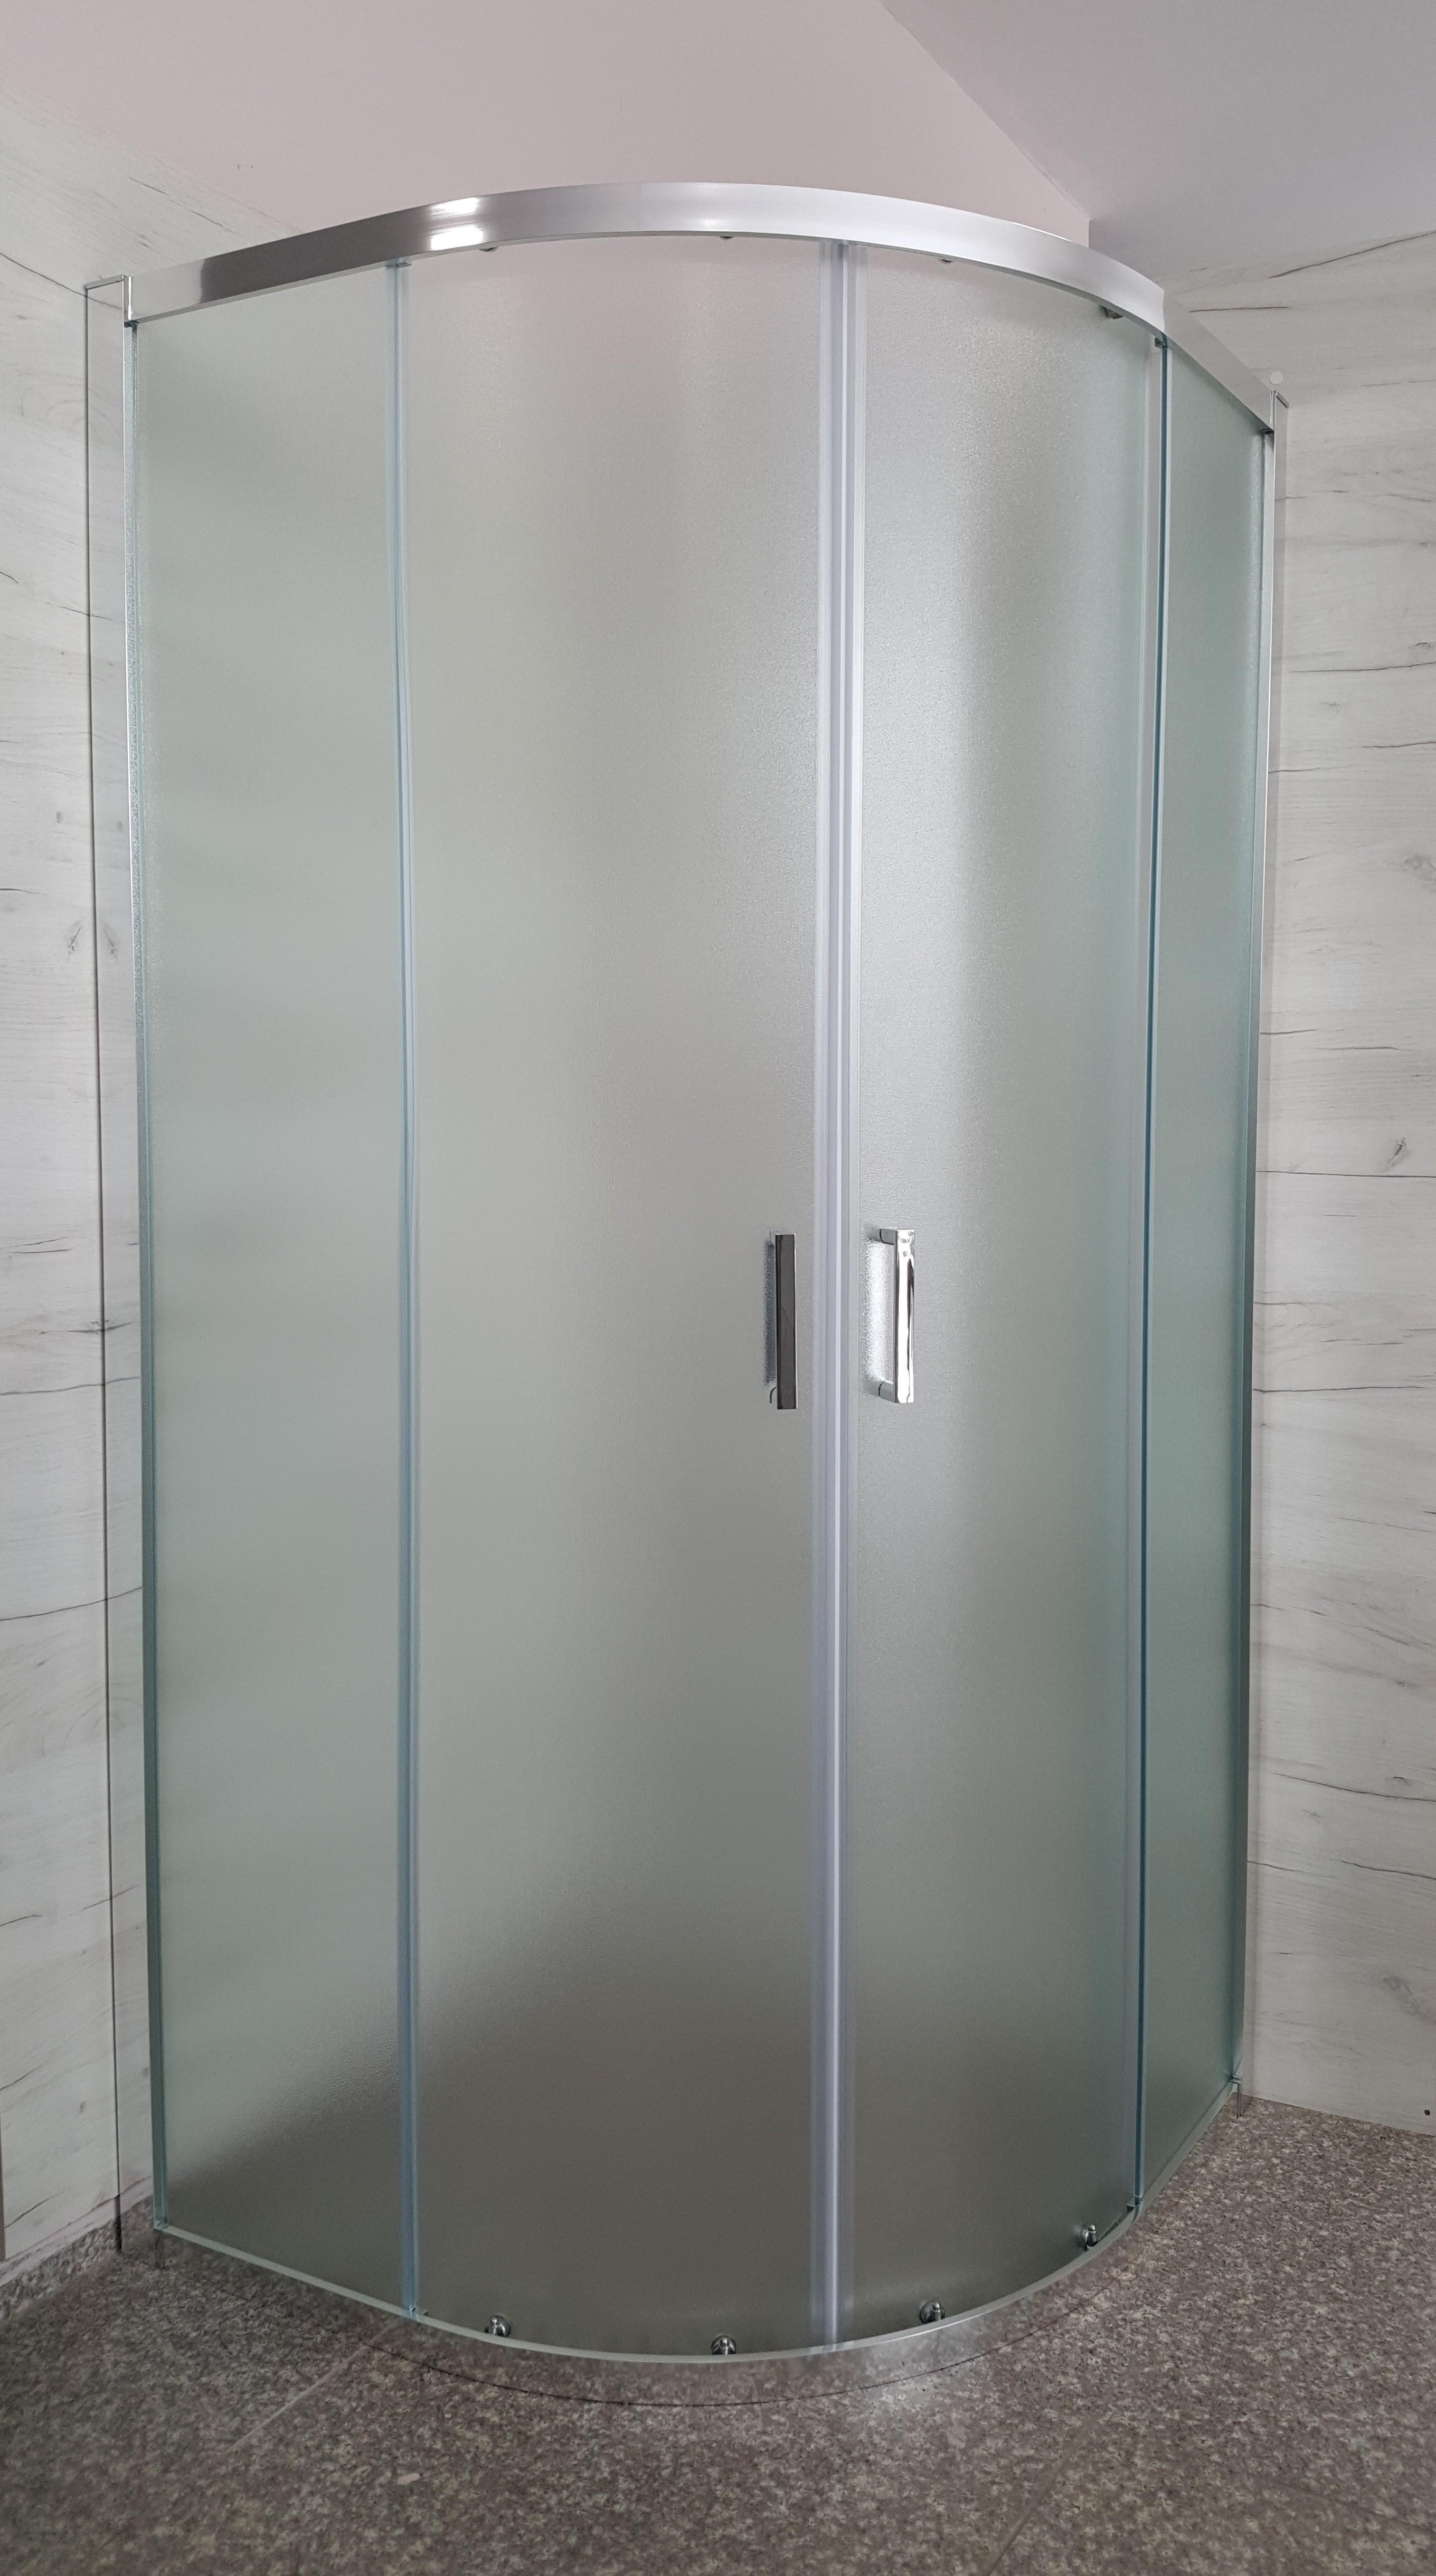 Душ кабина Изи 90/90см. мат стъкло